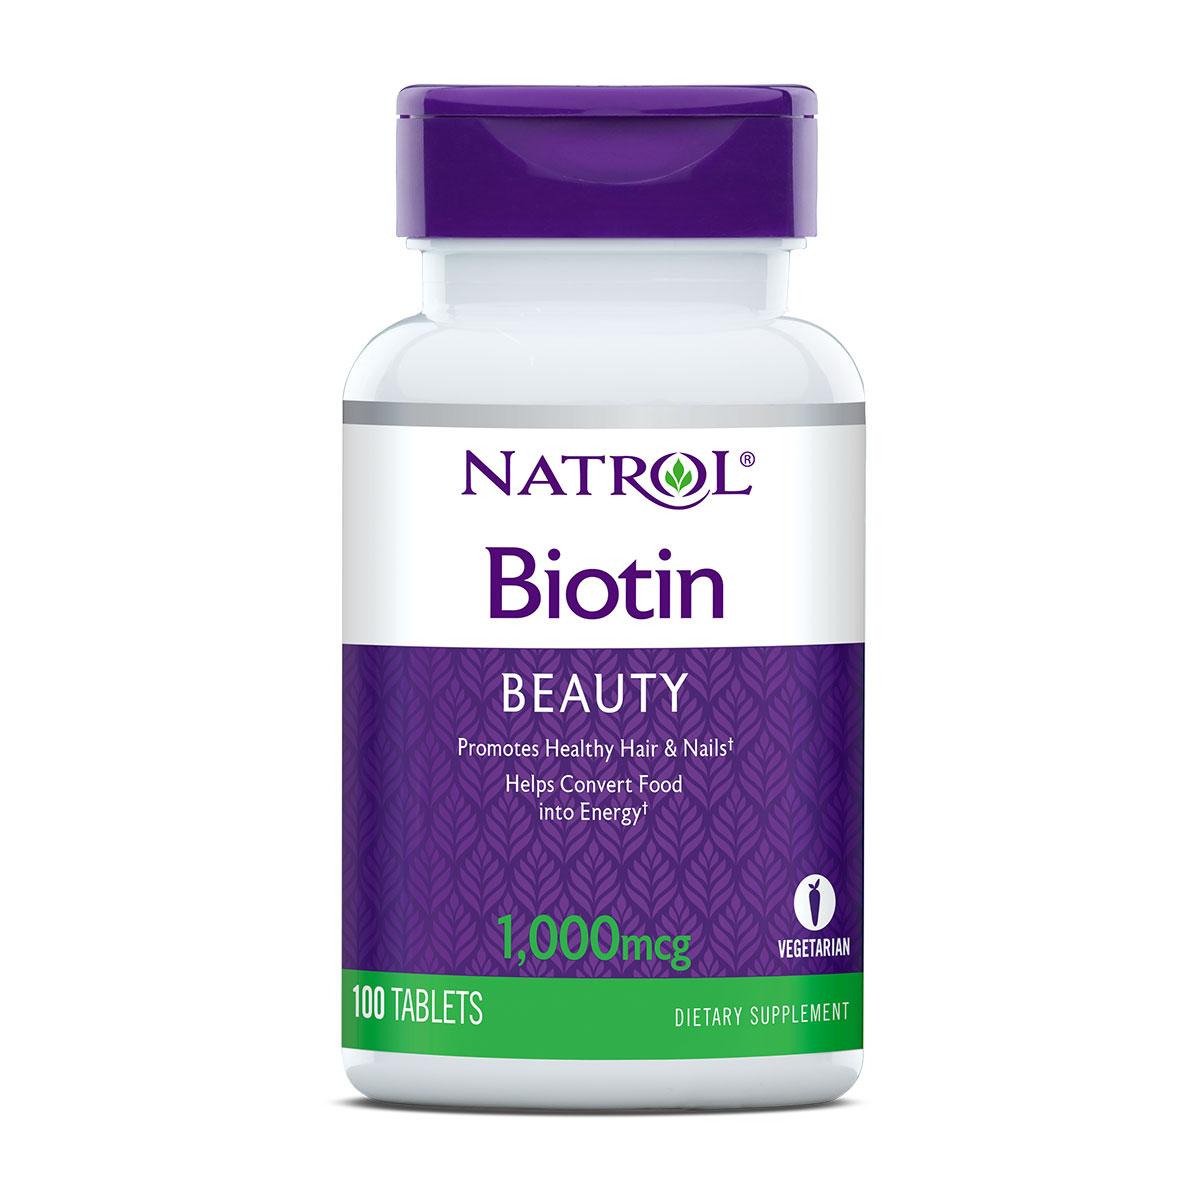 Natrol Biotin 1000mcg tablete